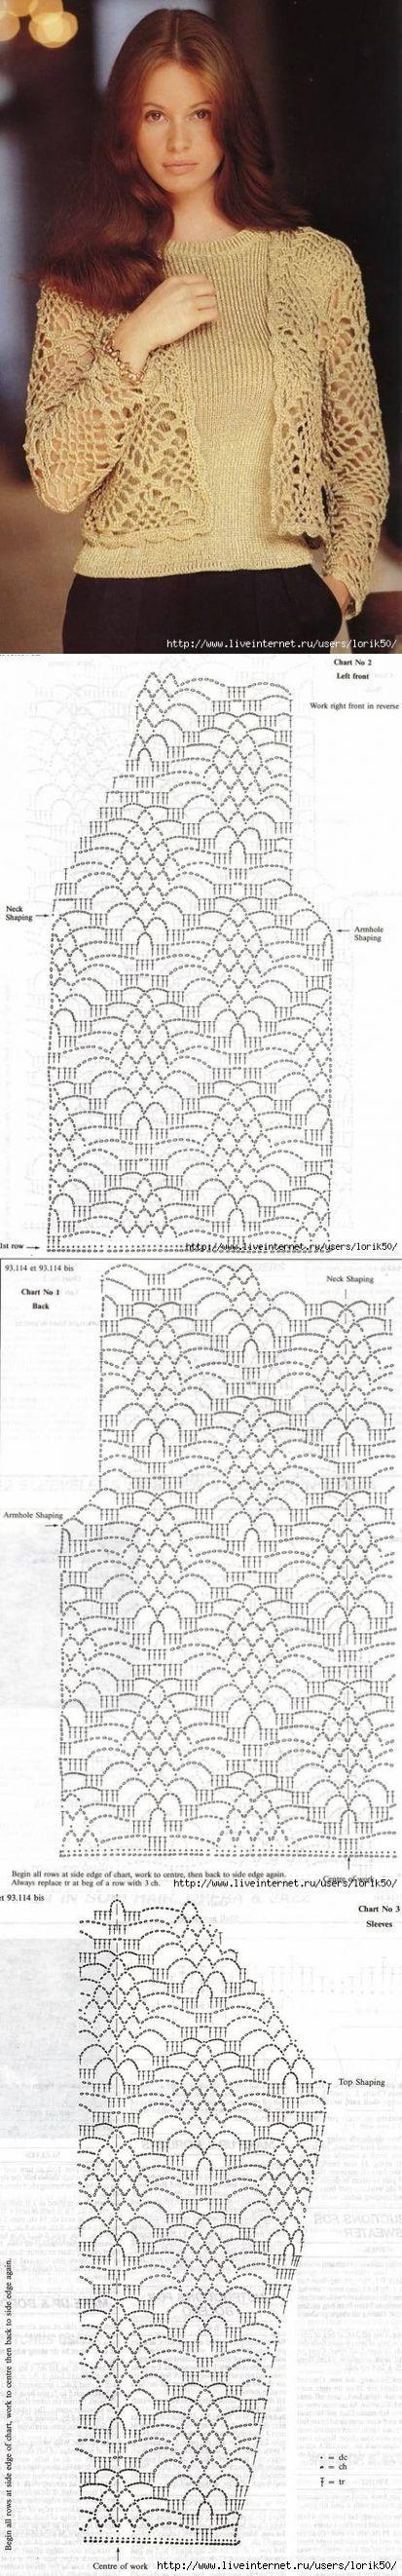 "bolero chaqueta de corto. [ ""Hermosa chaquetita calada, manga larga a crochet."", ""Bolero for my daughter and my mother."" ] #<br/> # #Bolero #Crochet,<br/> # #Crochet #Chart,<br/> # #Crochet #Cardigan,<br/> # #Crochet #Lace,<br/> # #Lace #Bolero,<br/> # #Crochet #Patterns,<br/> # #Short #Jackets,<br/> # #Bolero #Pattern,<br/> # #Shorts<br/>"